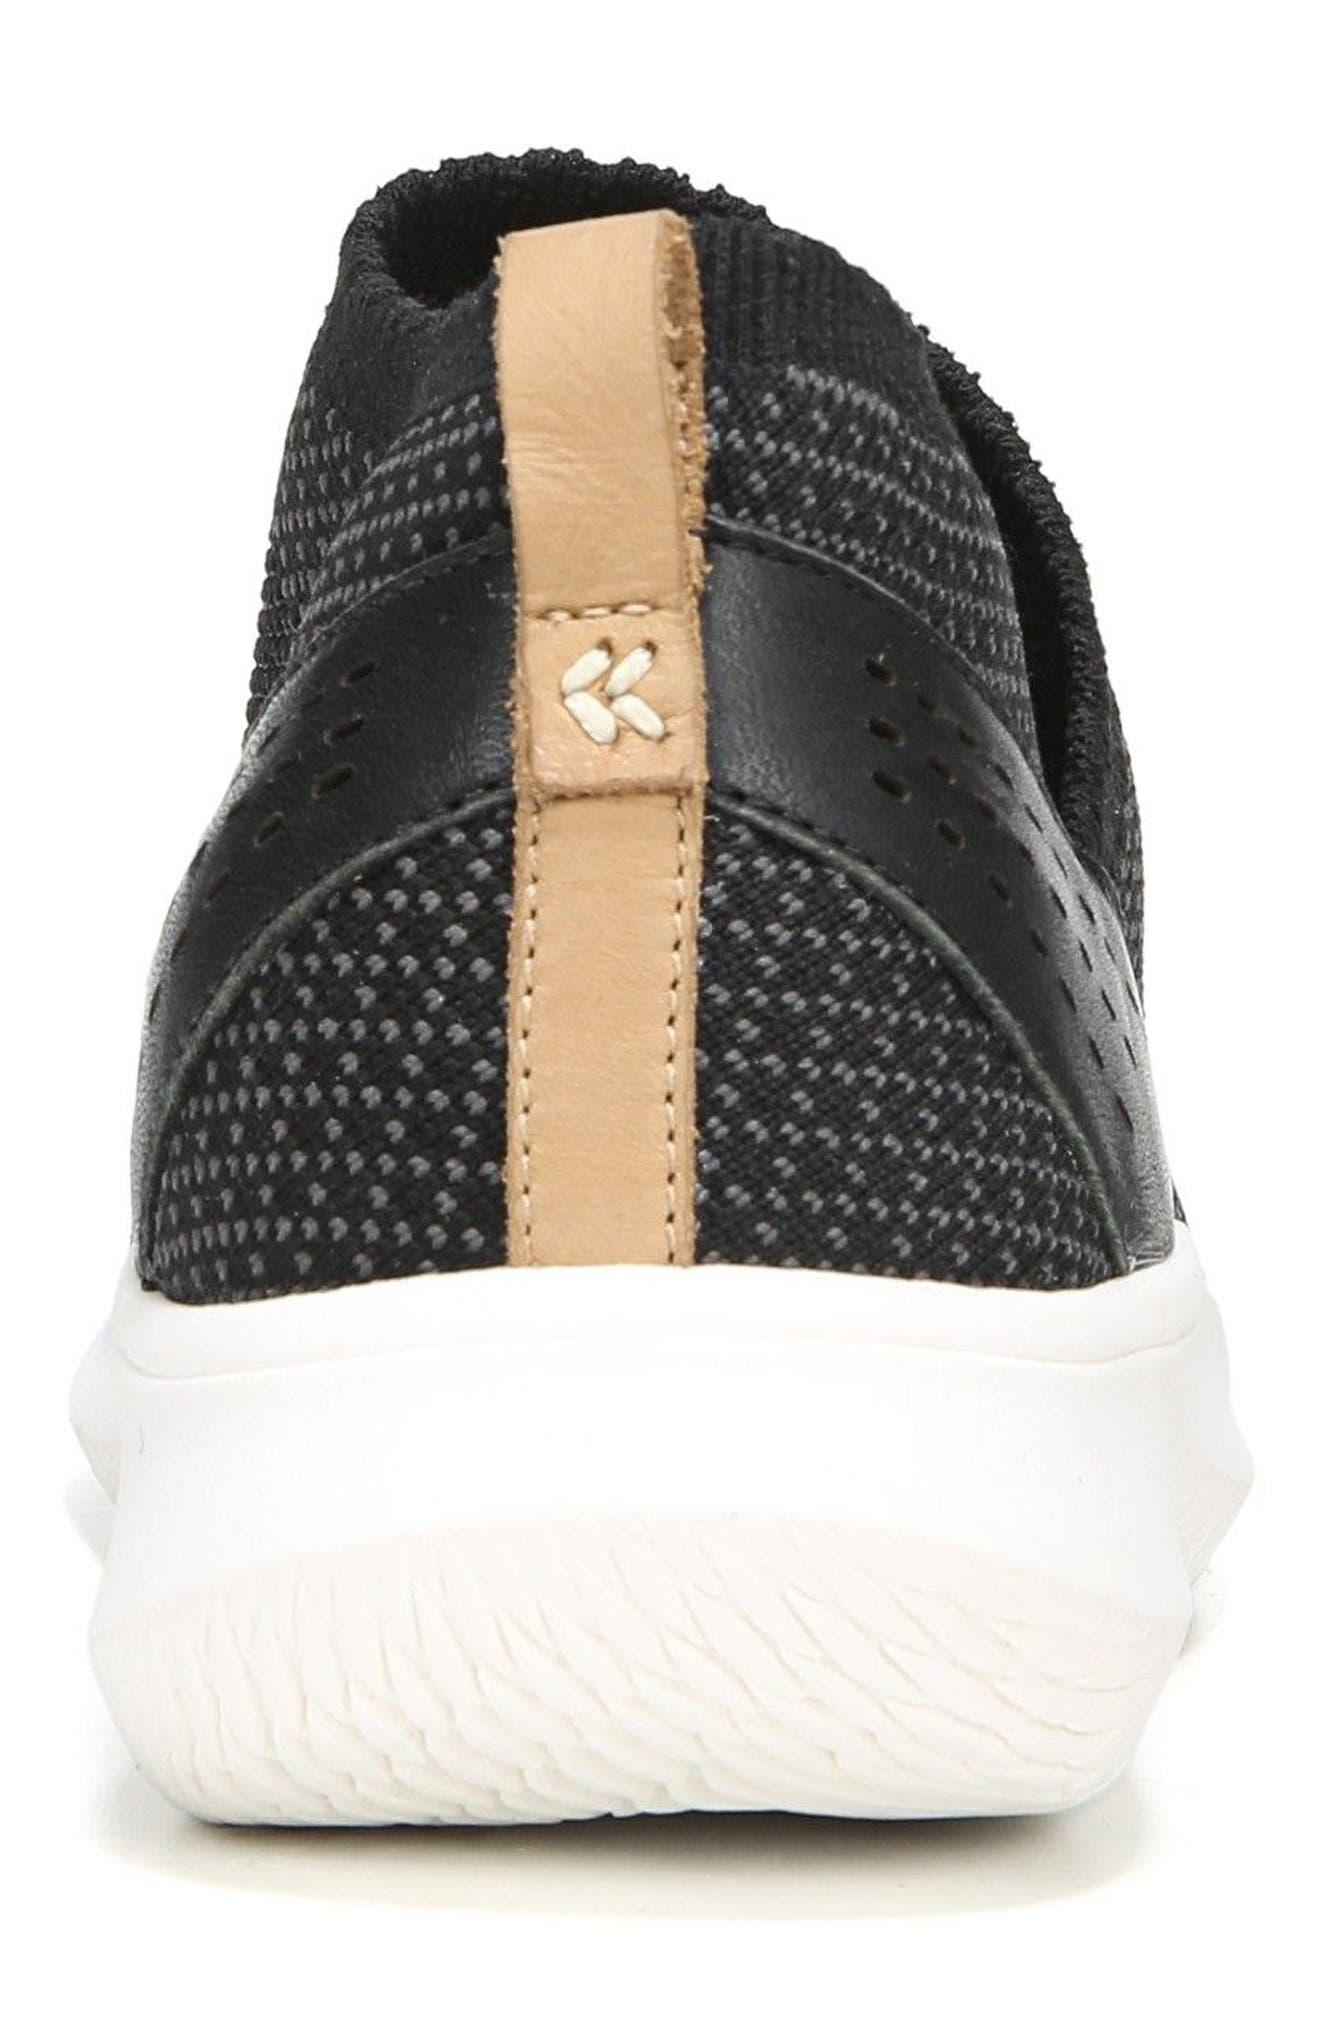 Fierce Knit Slip-On Sneaker,                             Alternate thumbnail 8, color,                             BLACK KNIT FABRIC